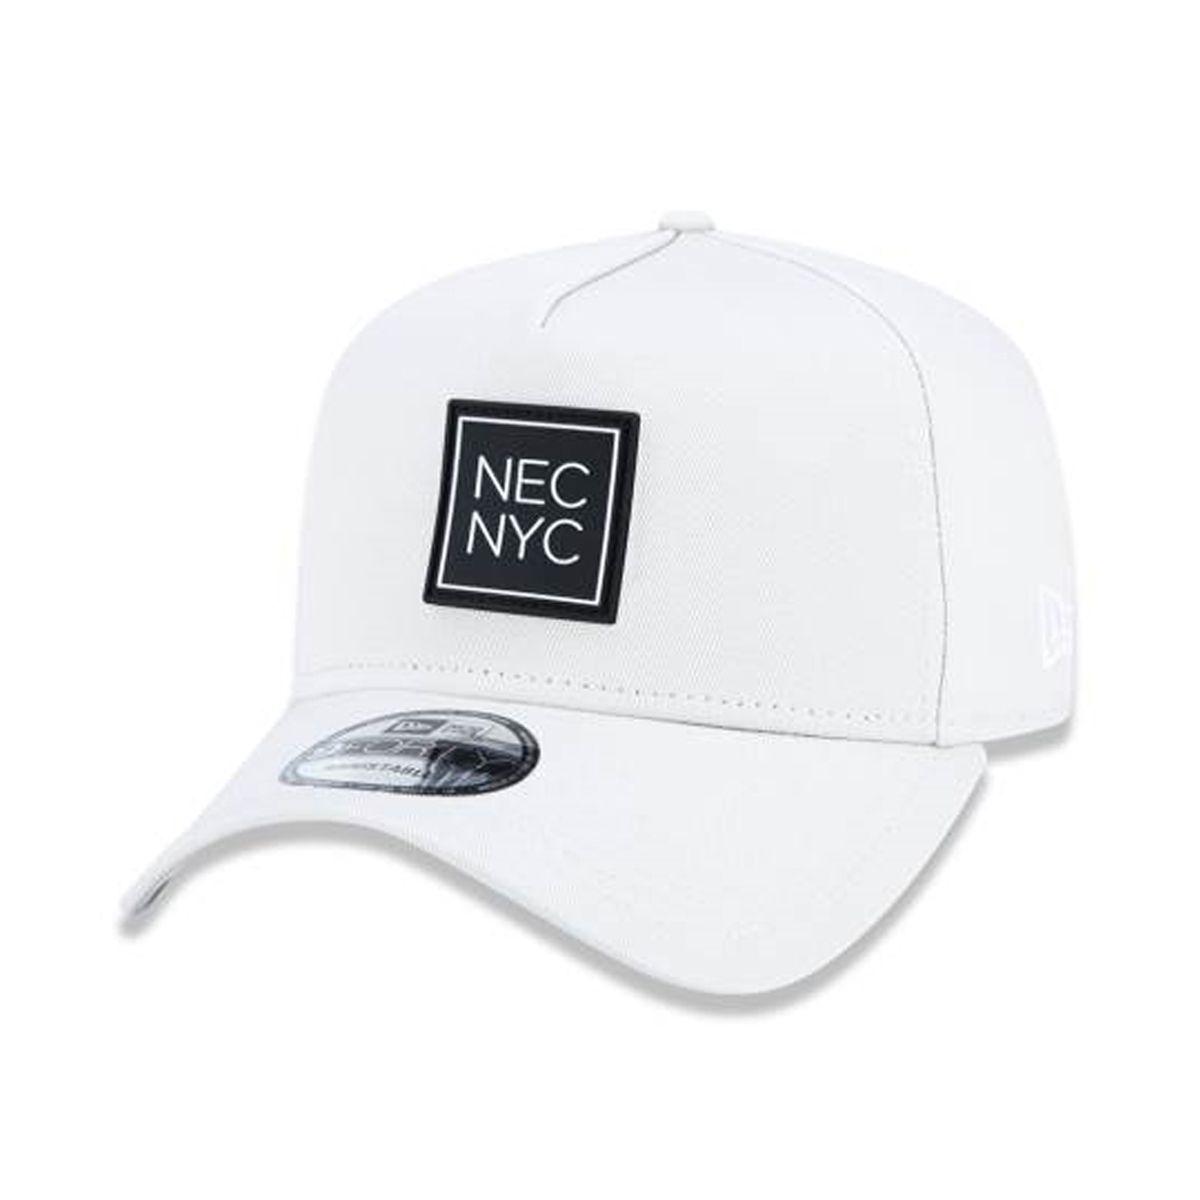 Boné New Era Masculino NEC NYC Bege